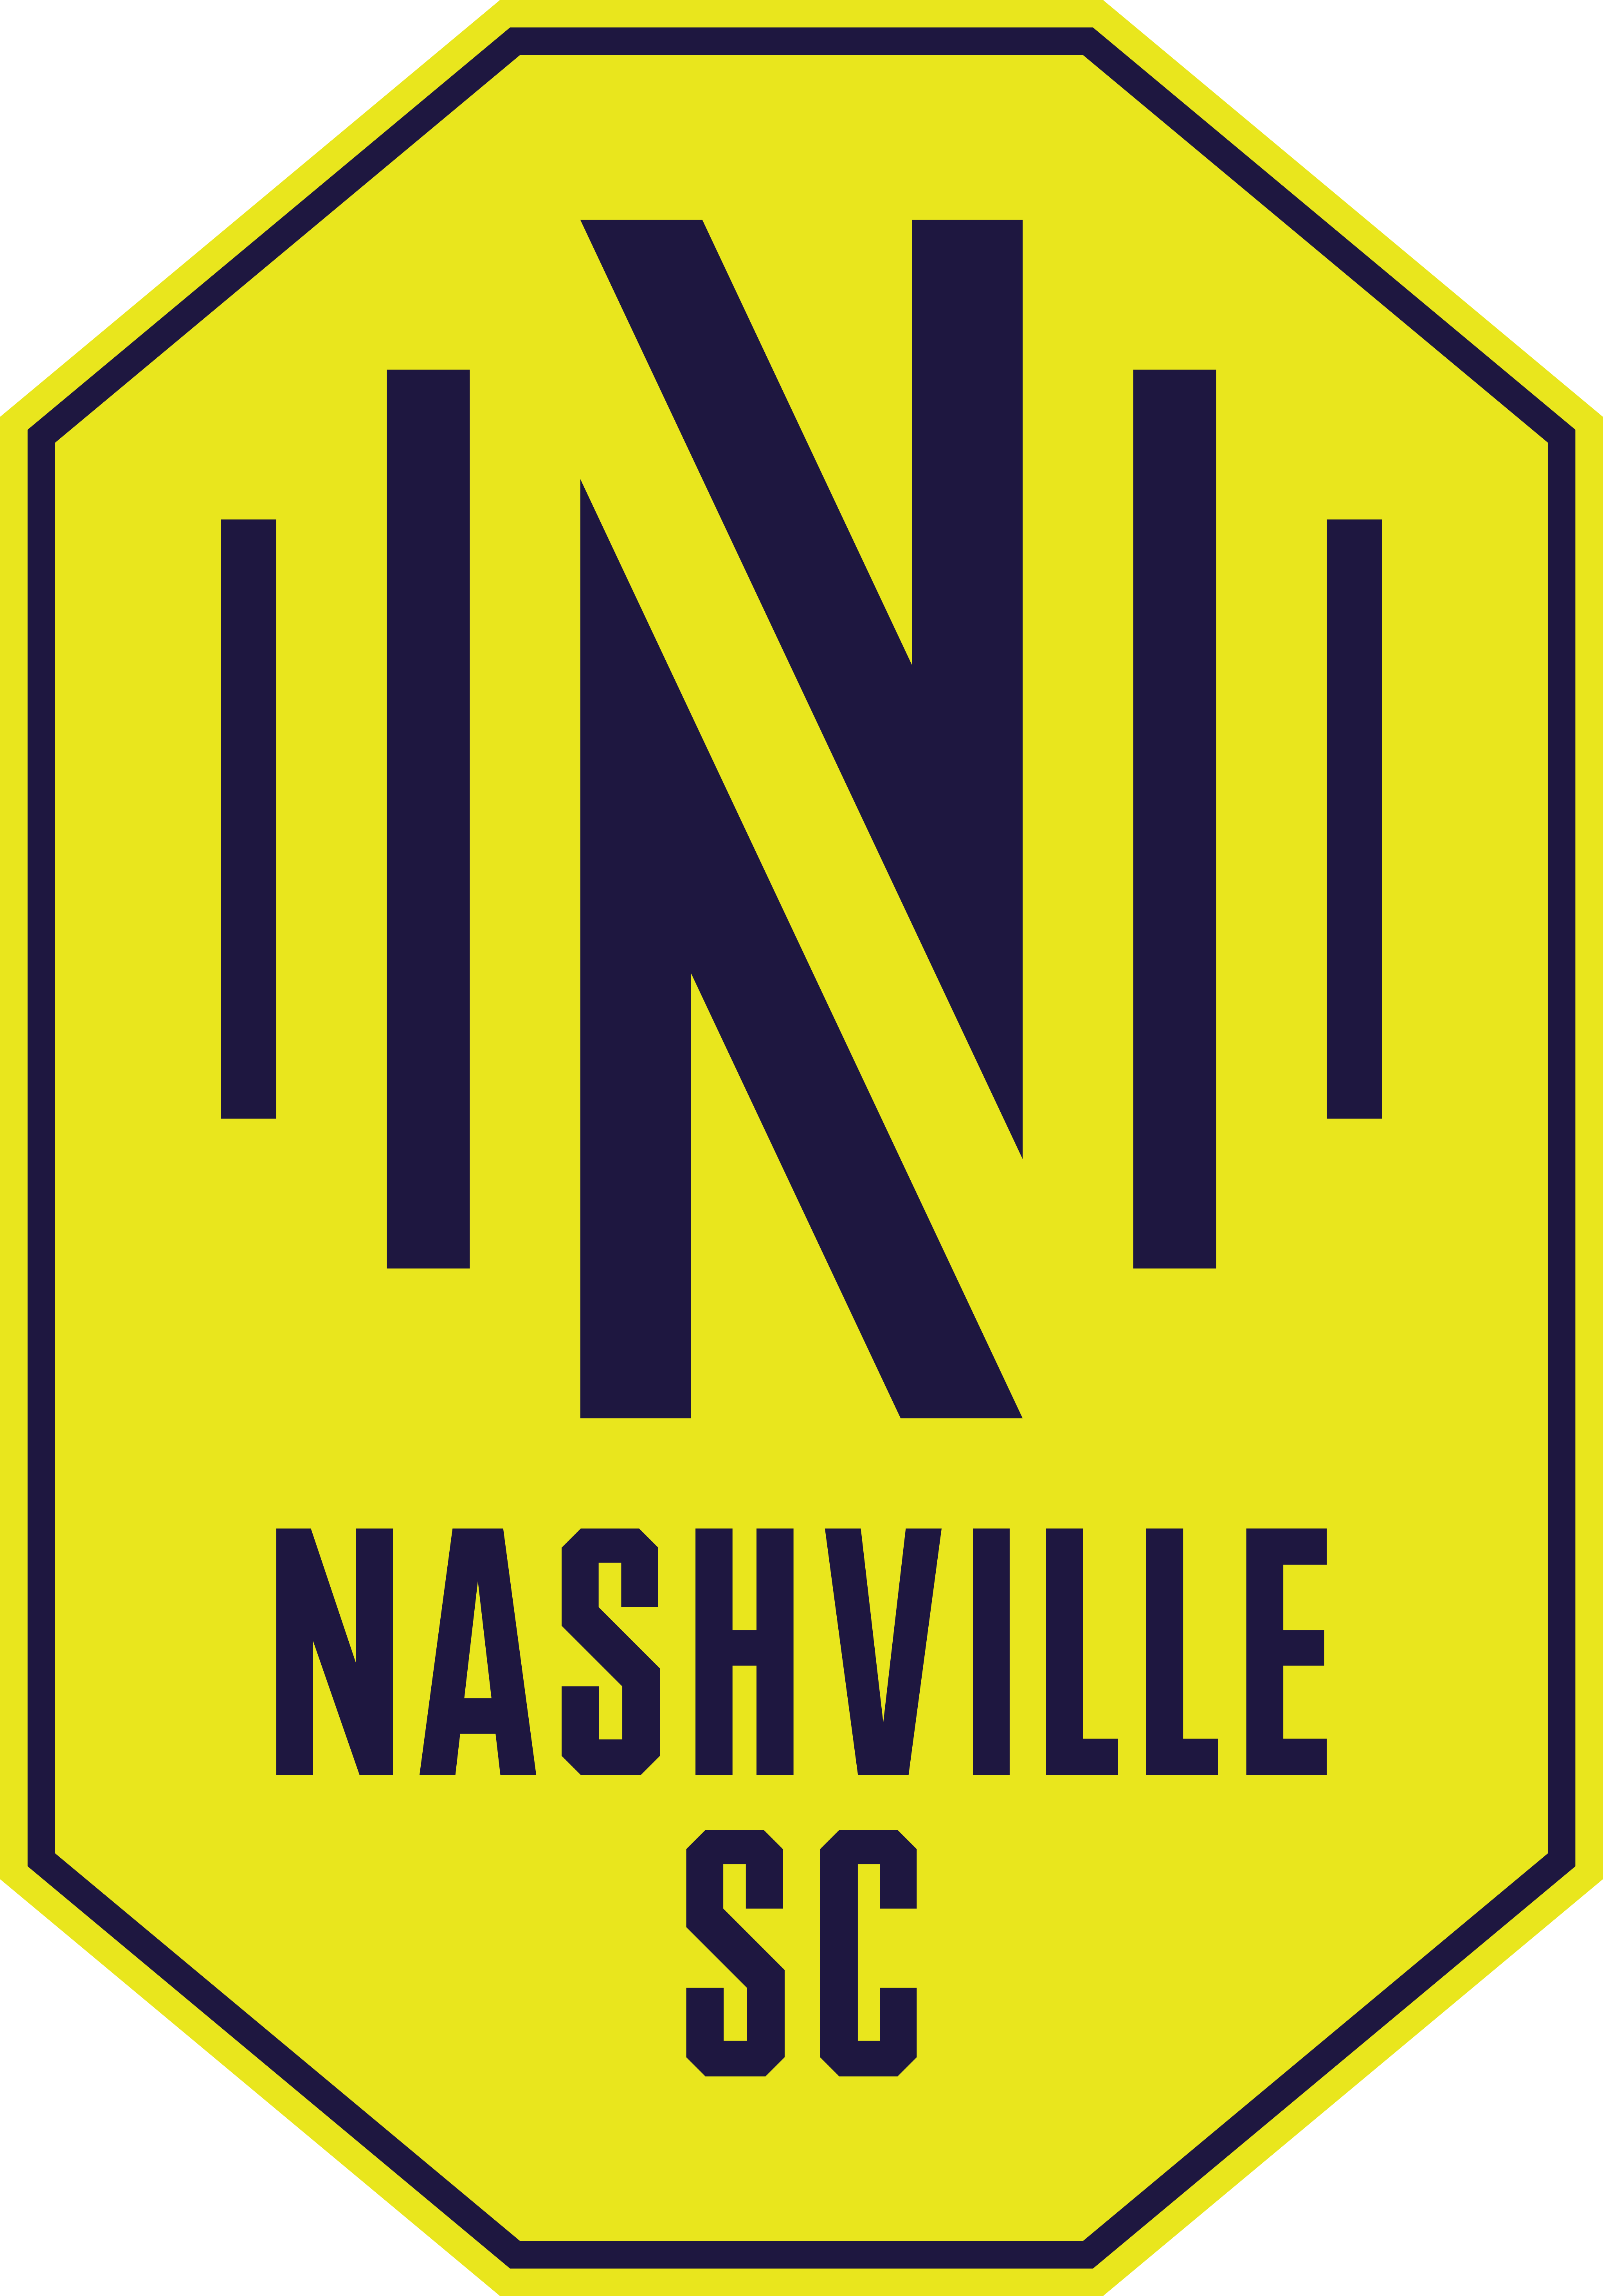 nashville soccer club logo - Nashville Soccer Club logo